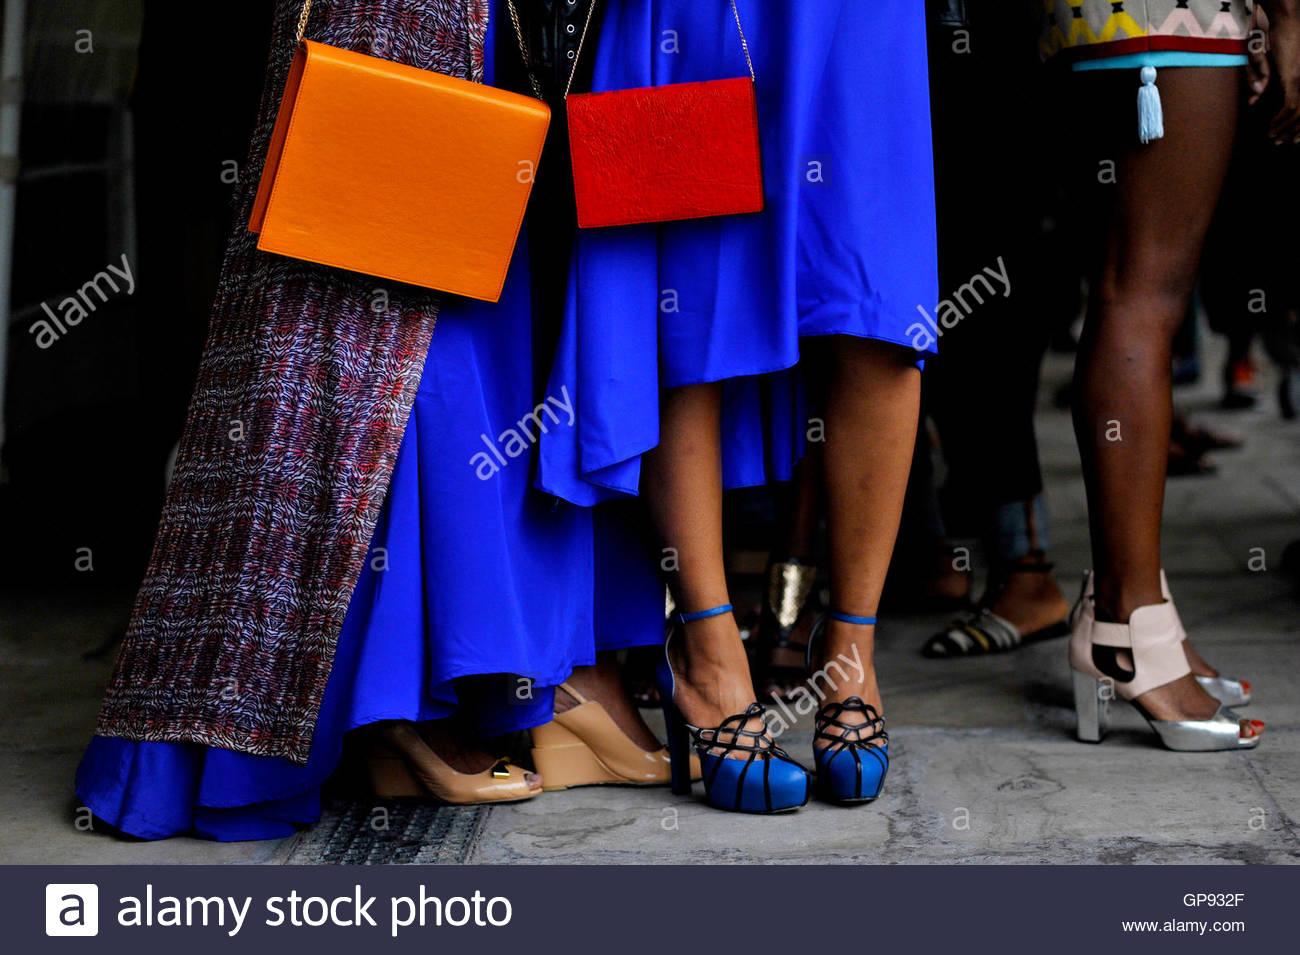 Models backstage at Africa Utopia Fashion Event Southbank London, England UK September 3 2016. Credit:  wayne Tippetts/Alamy - Stock Image